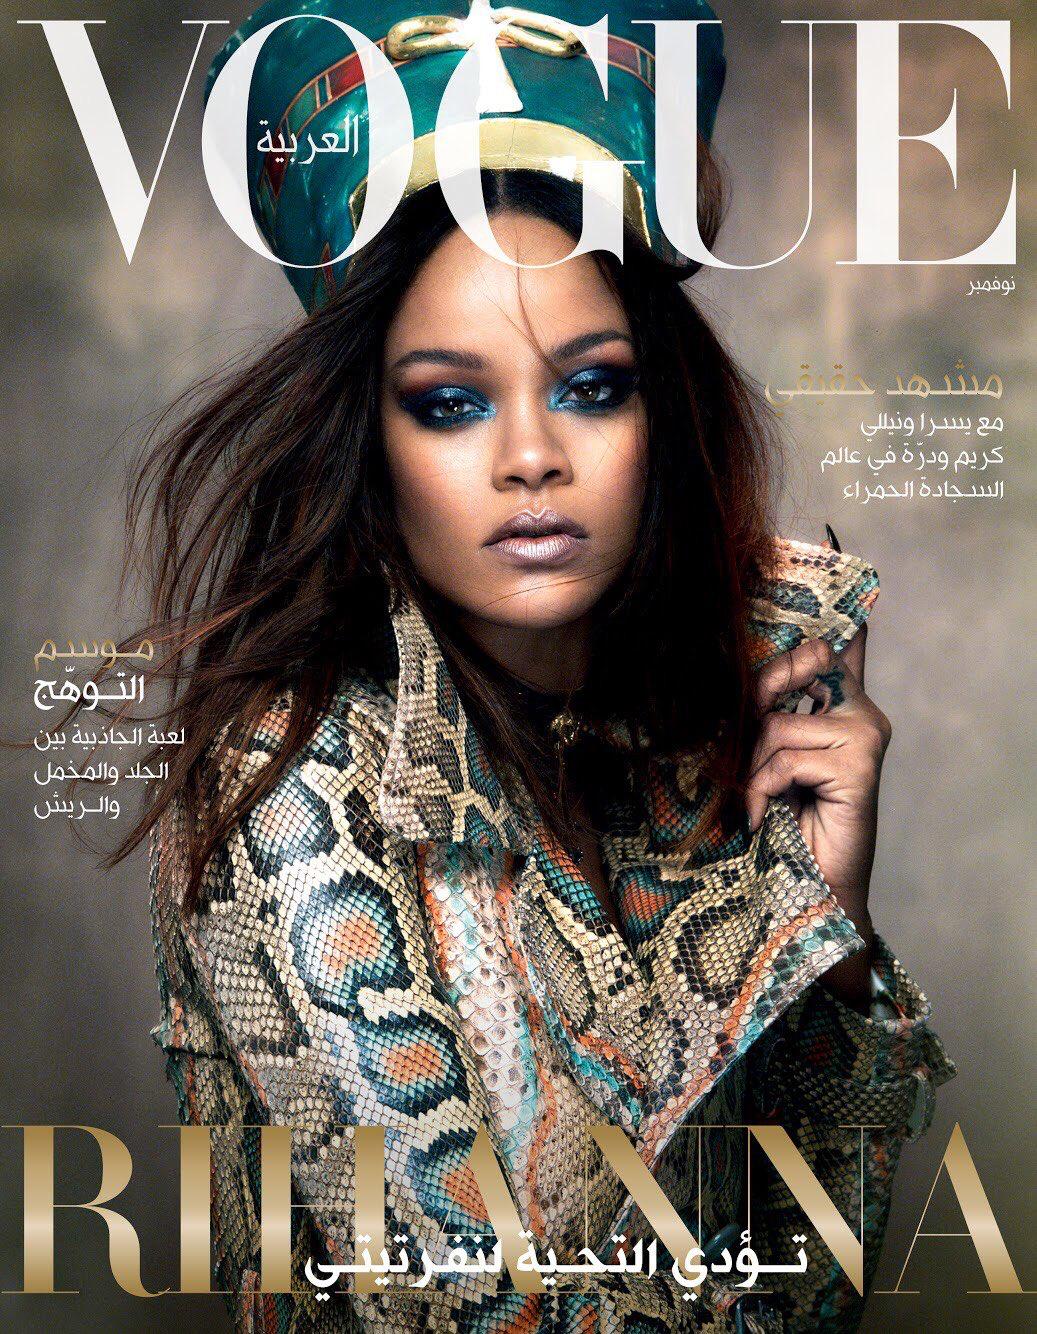 Rihanna Looks Fierce on Vogue's November 2012 Cover forecasting